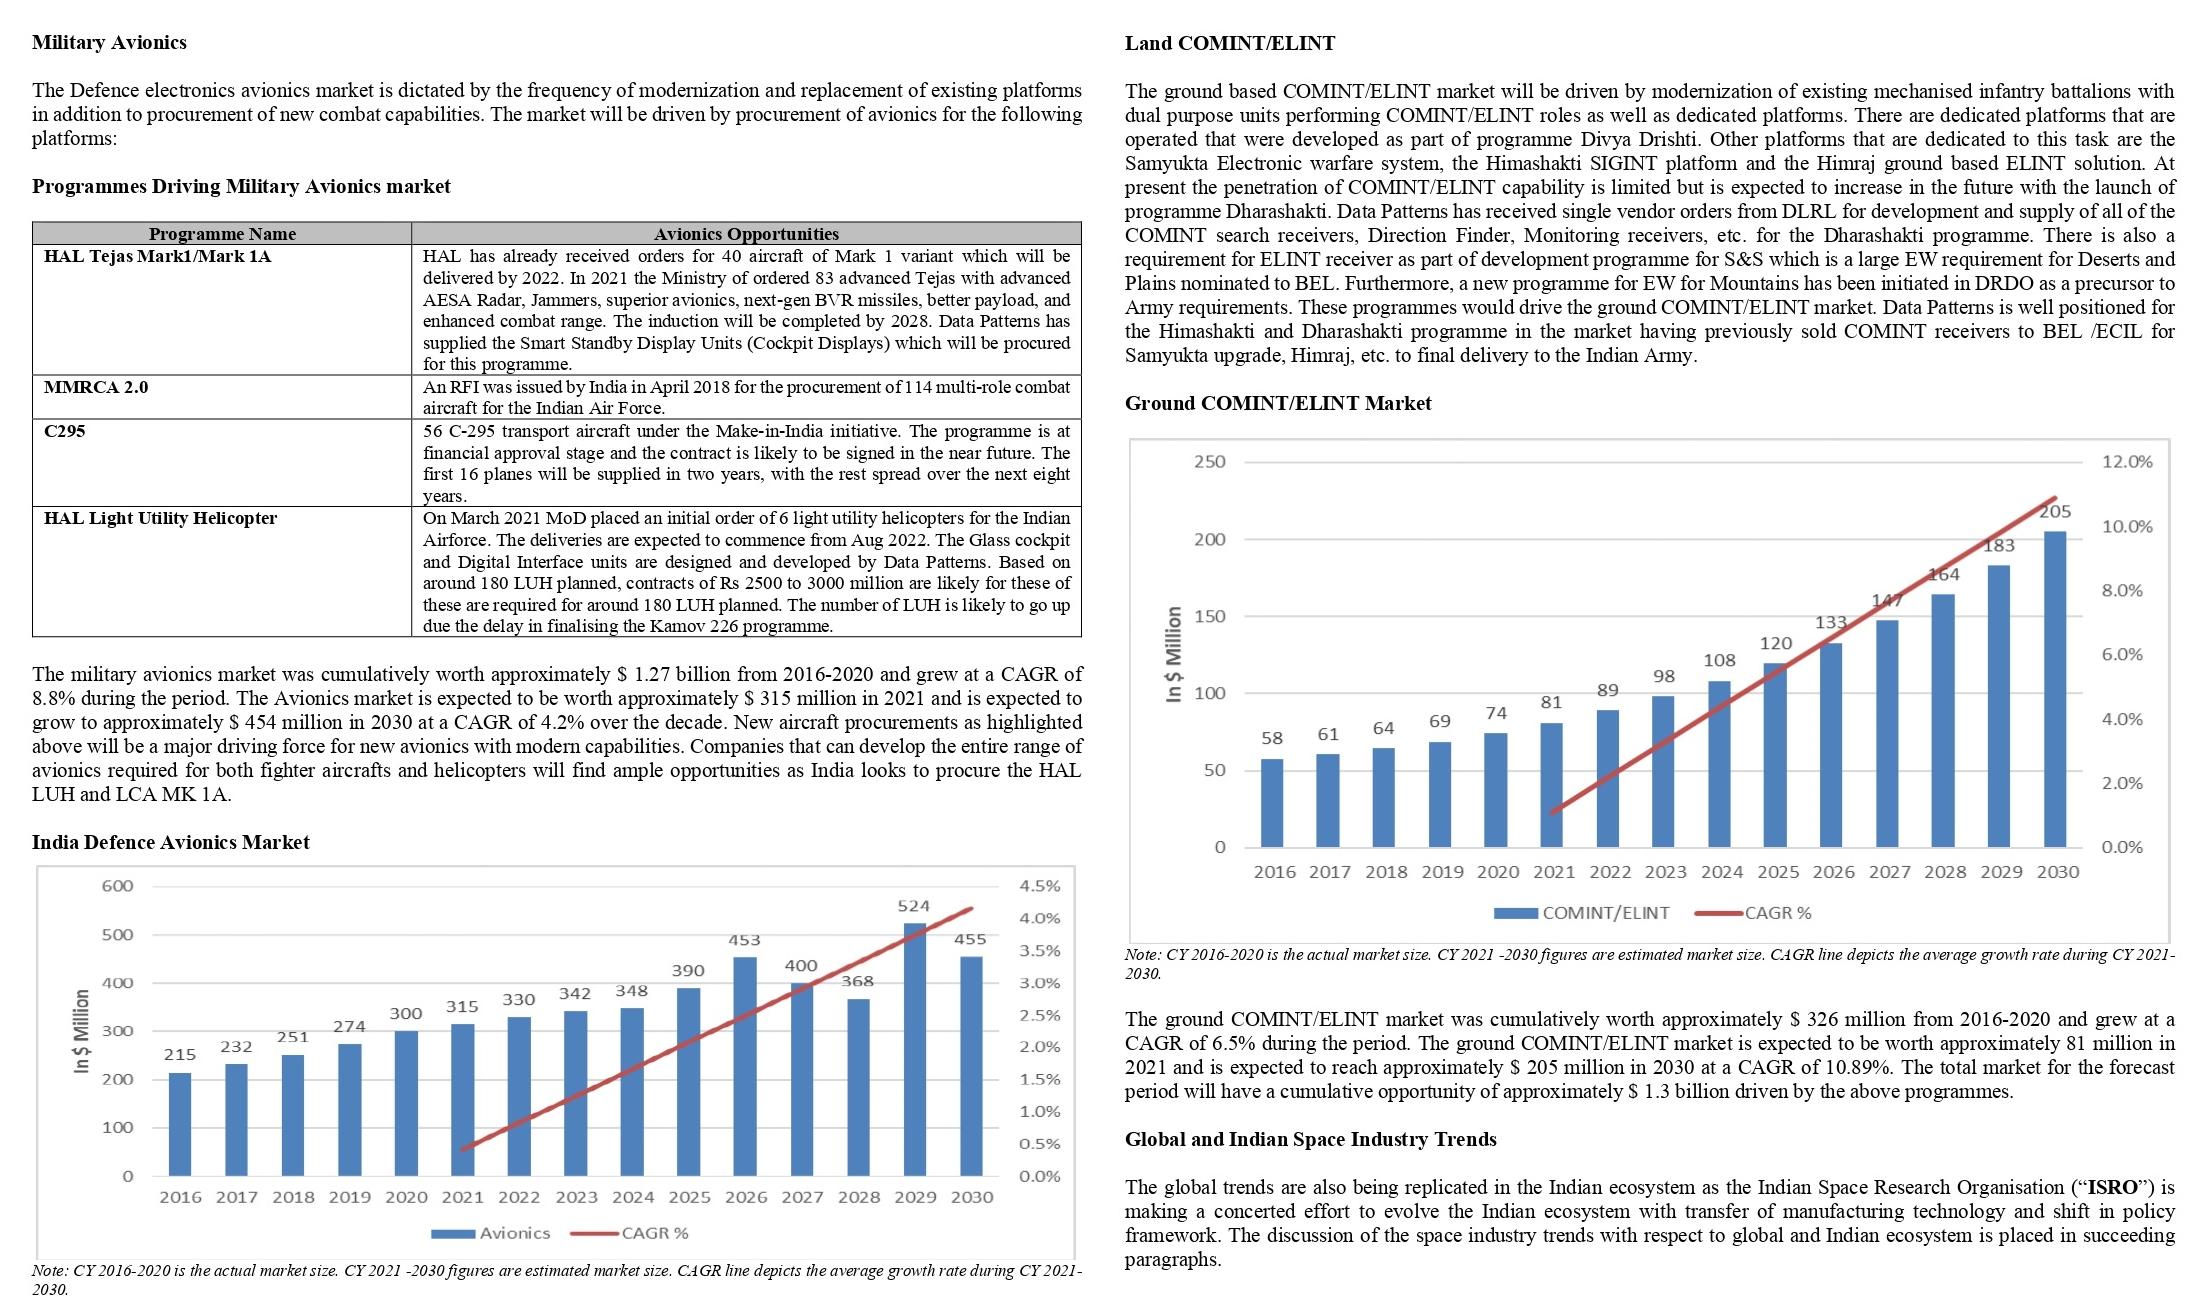 Data Patterns Defence market overview-2.png